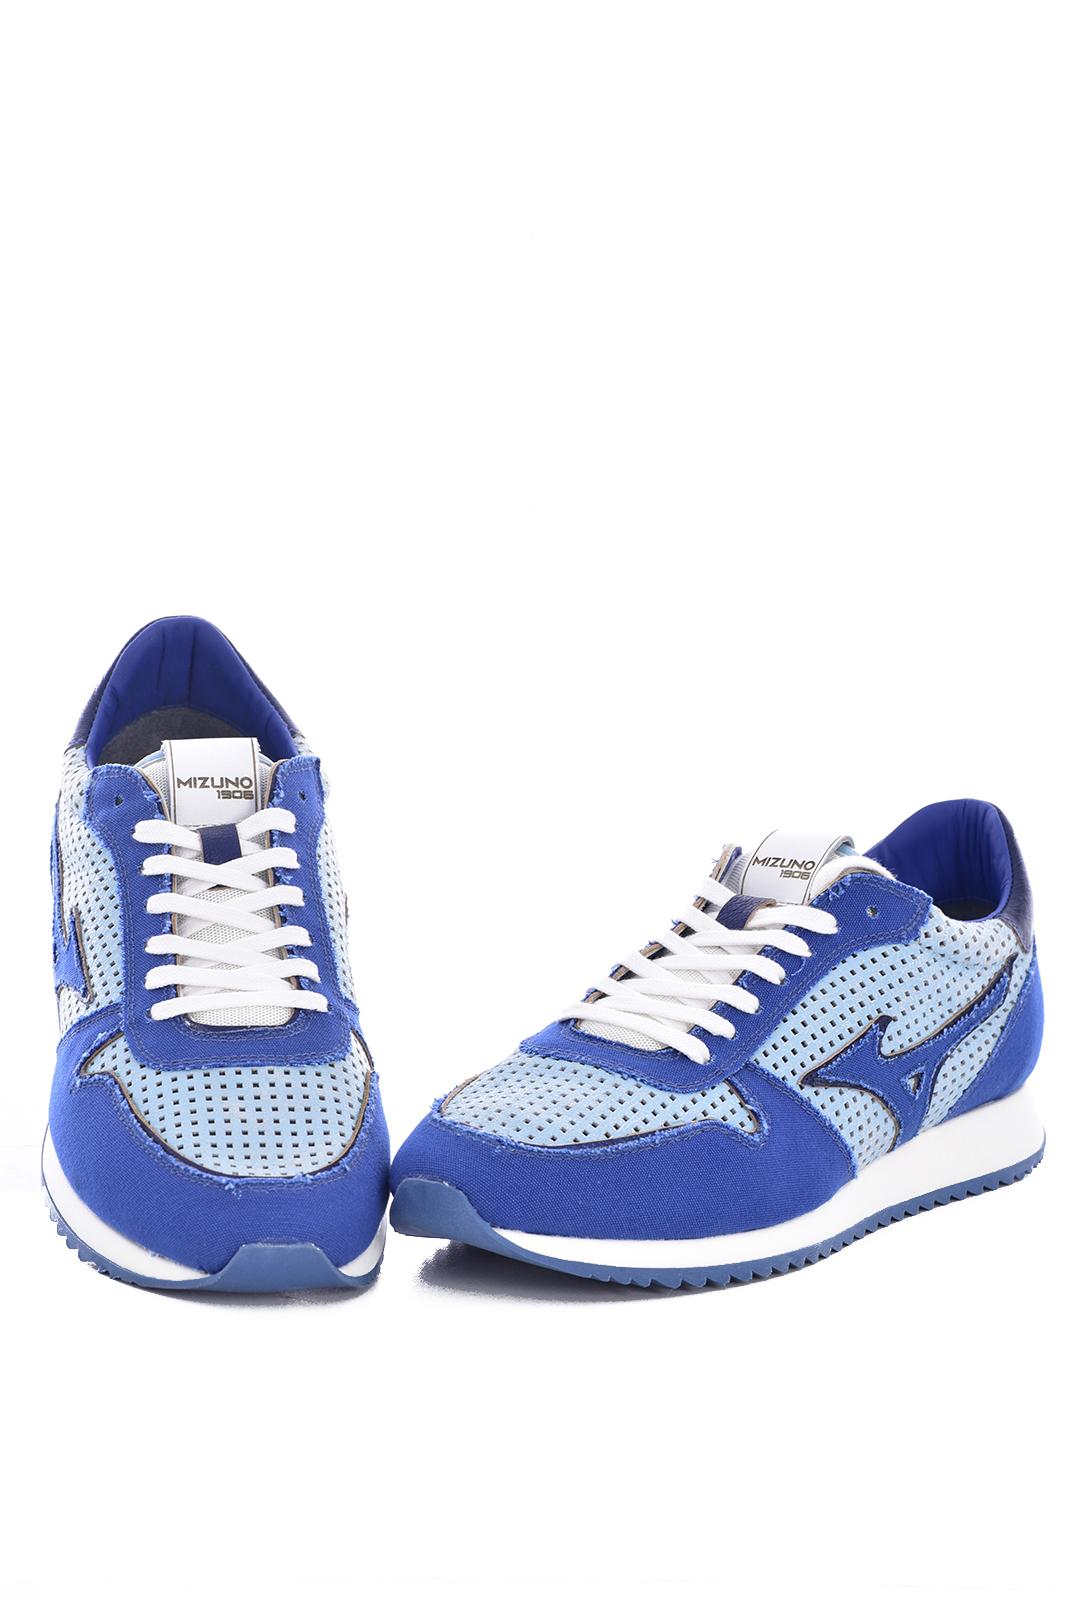 Chaussures   Mizuno D1GB196026 ETAMIN ETAMIN PERFOR LIGHT BLUE/BL